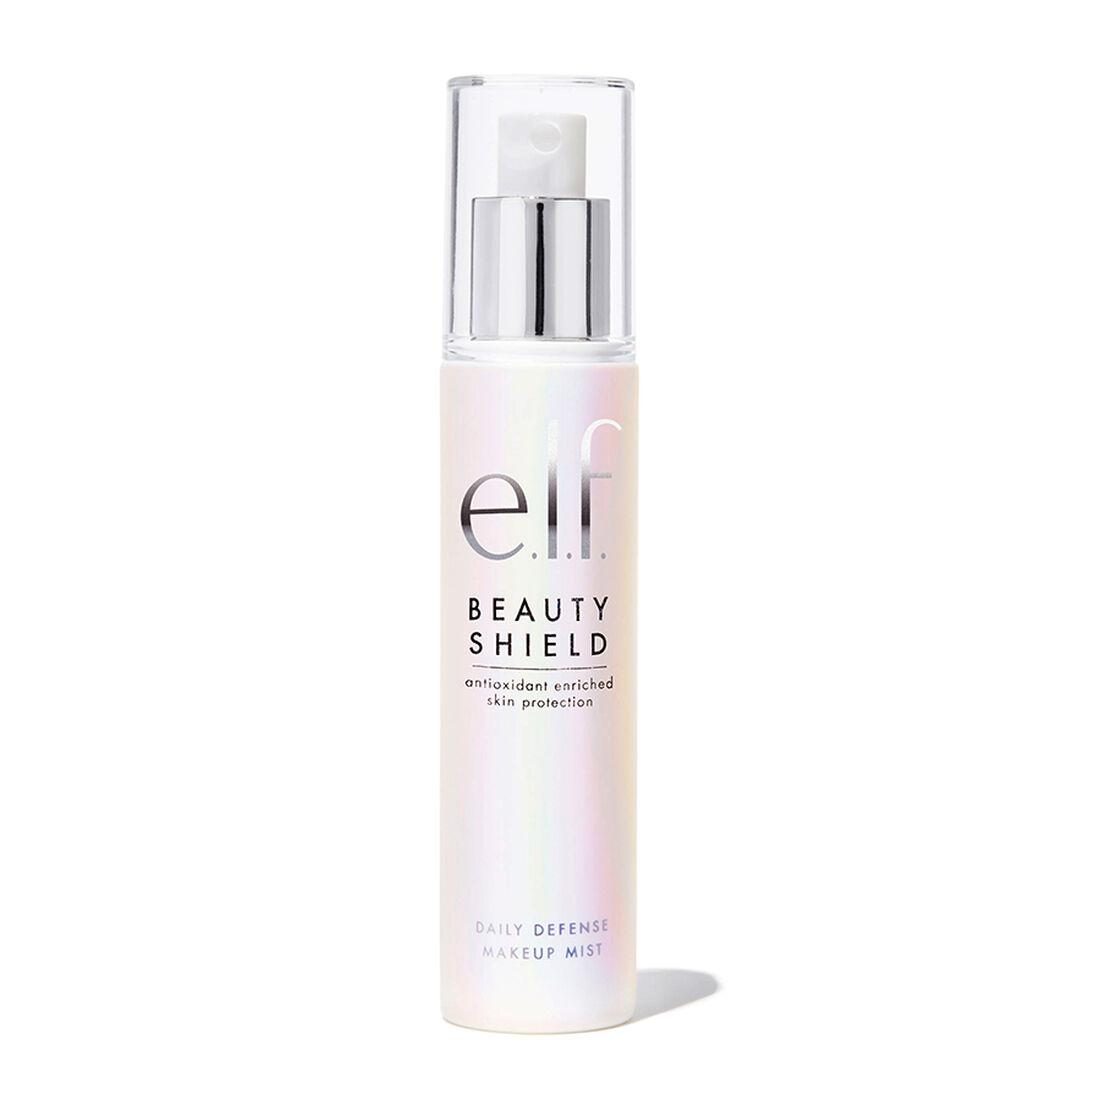 E.l.f. - Beauty Shield Daily Defense Makeup Mist